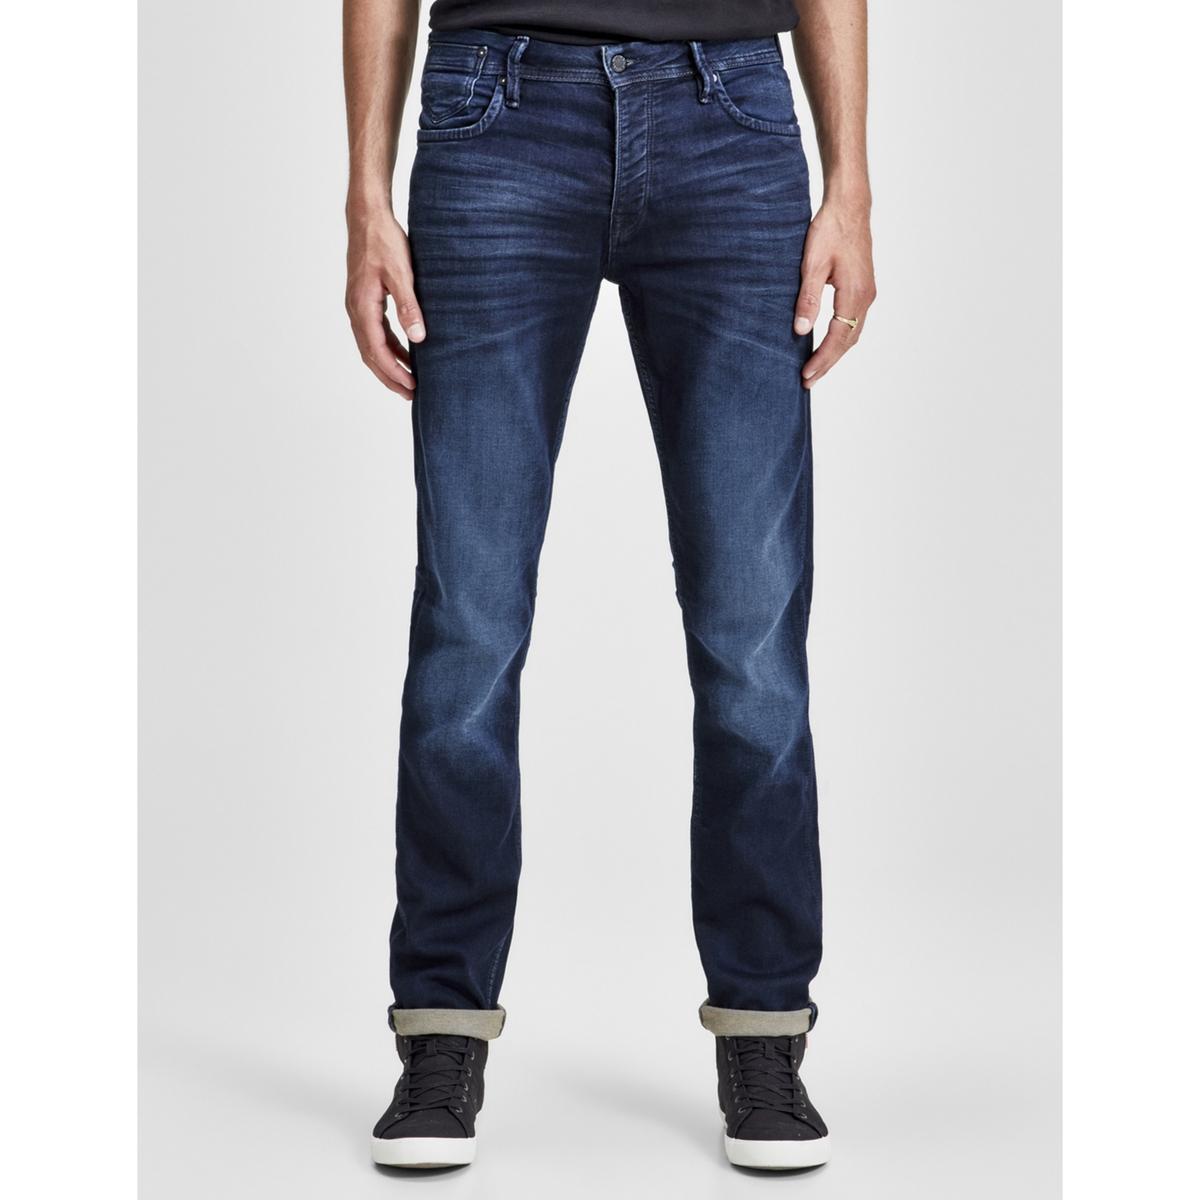 Slim-Fit-Jeans JJITIM JJLEON| Five-Pocket-Form| Stretch | Bekleidung > Jeans > Slim Fit Jeans | Blau | Elasthan | JACK & JONES